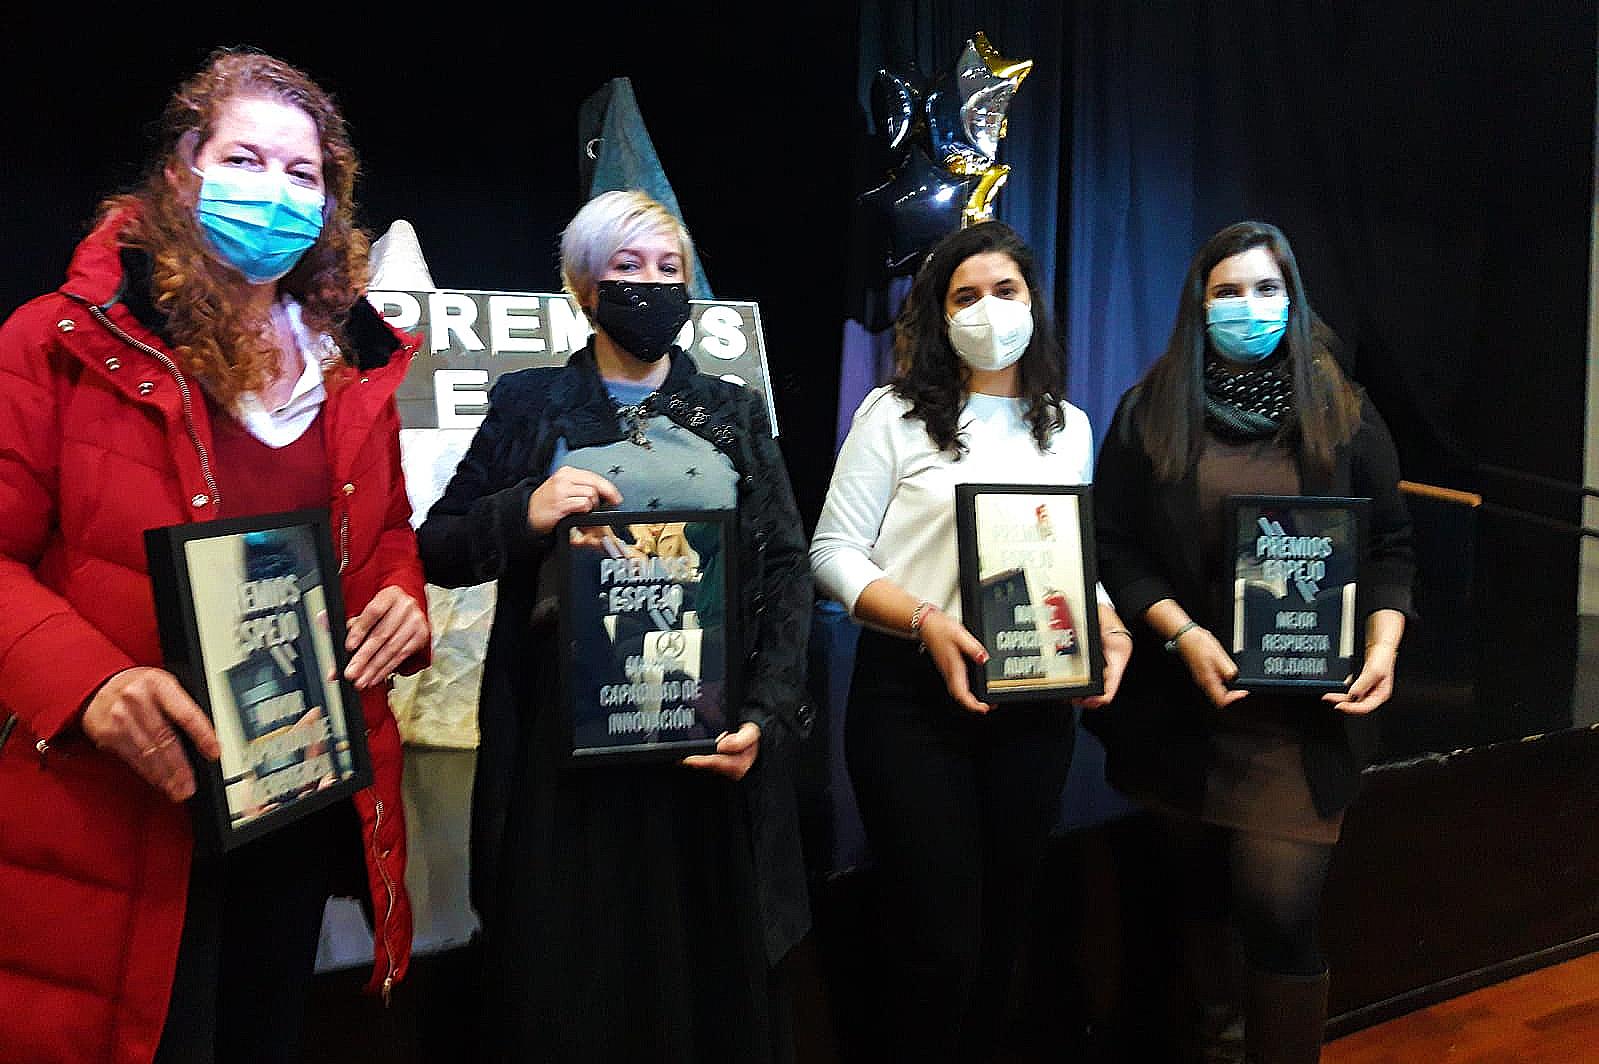 Premios Espejo palmarés 2020